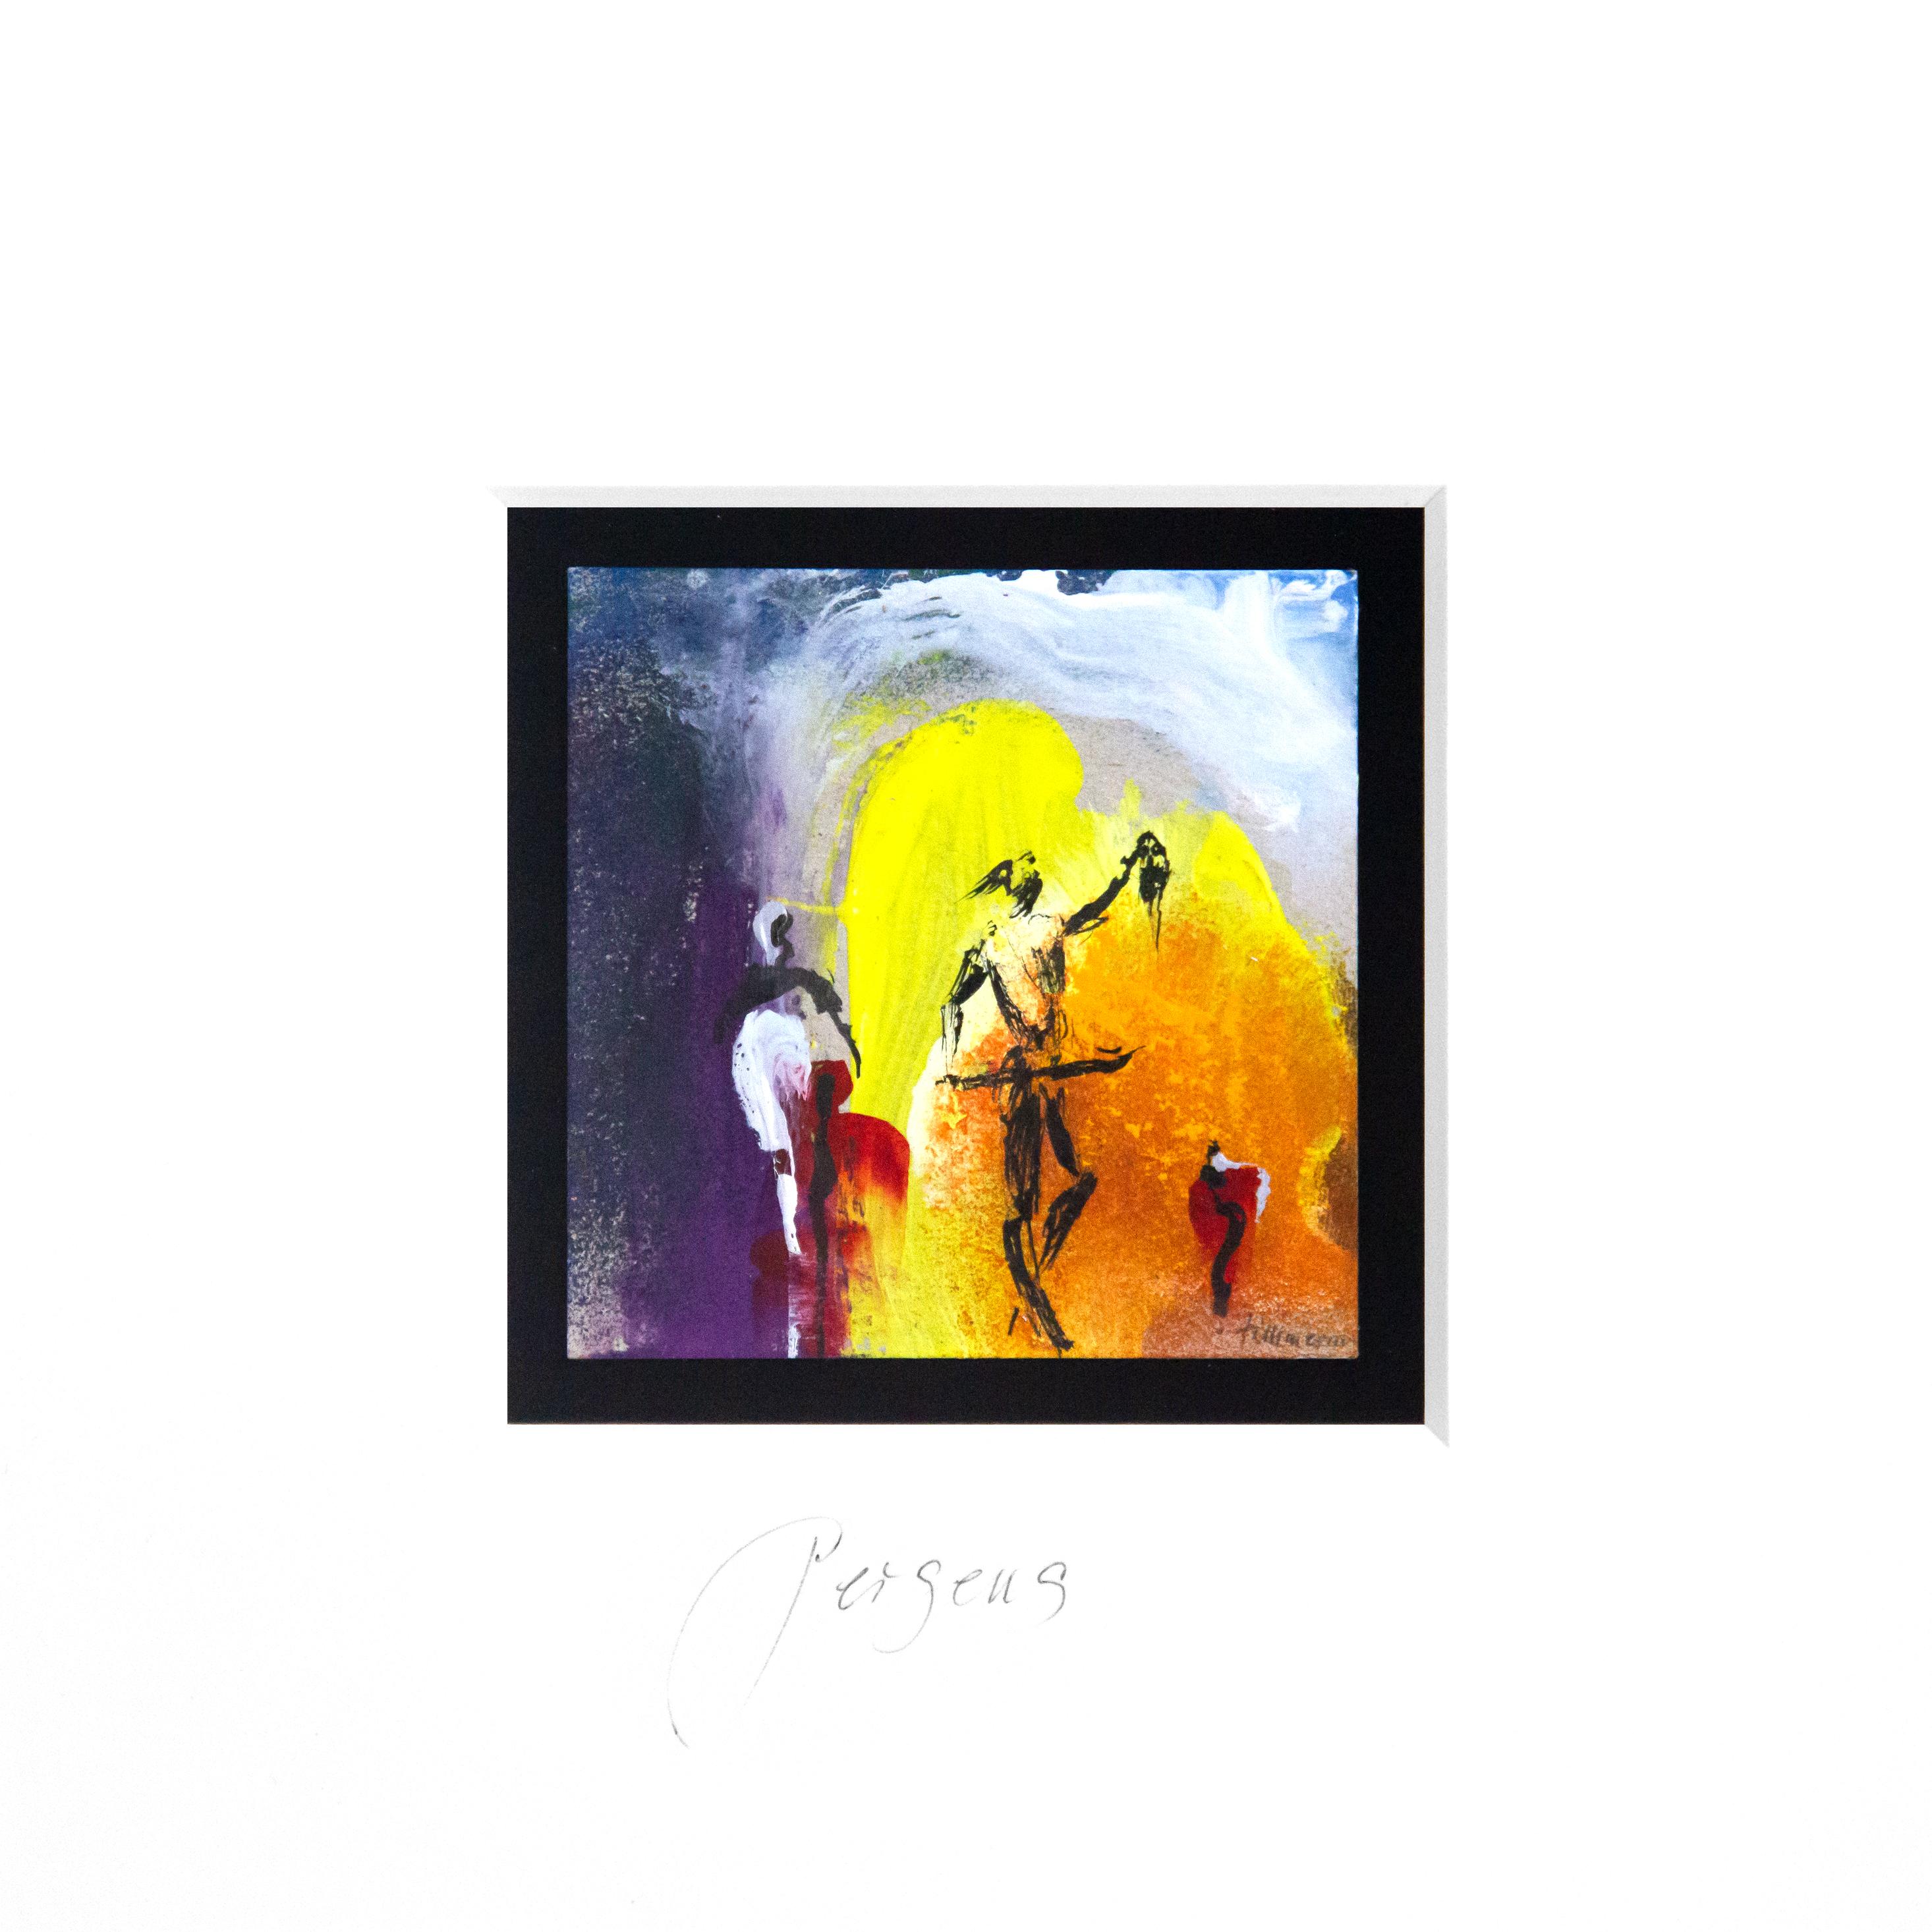 Perseus (Miniatur-Gemälde)